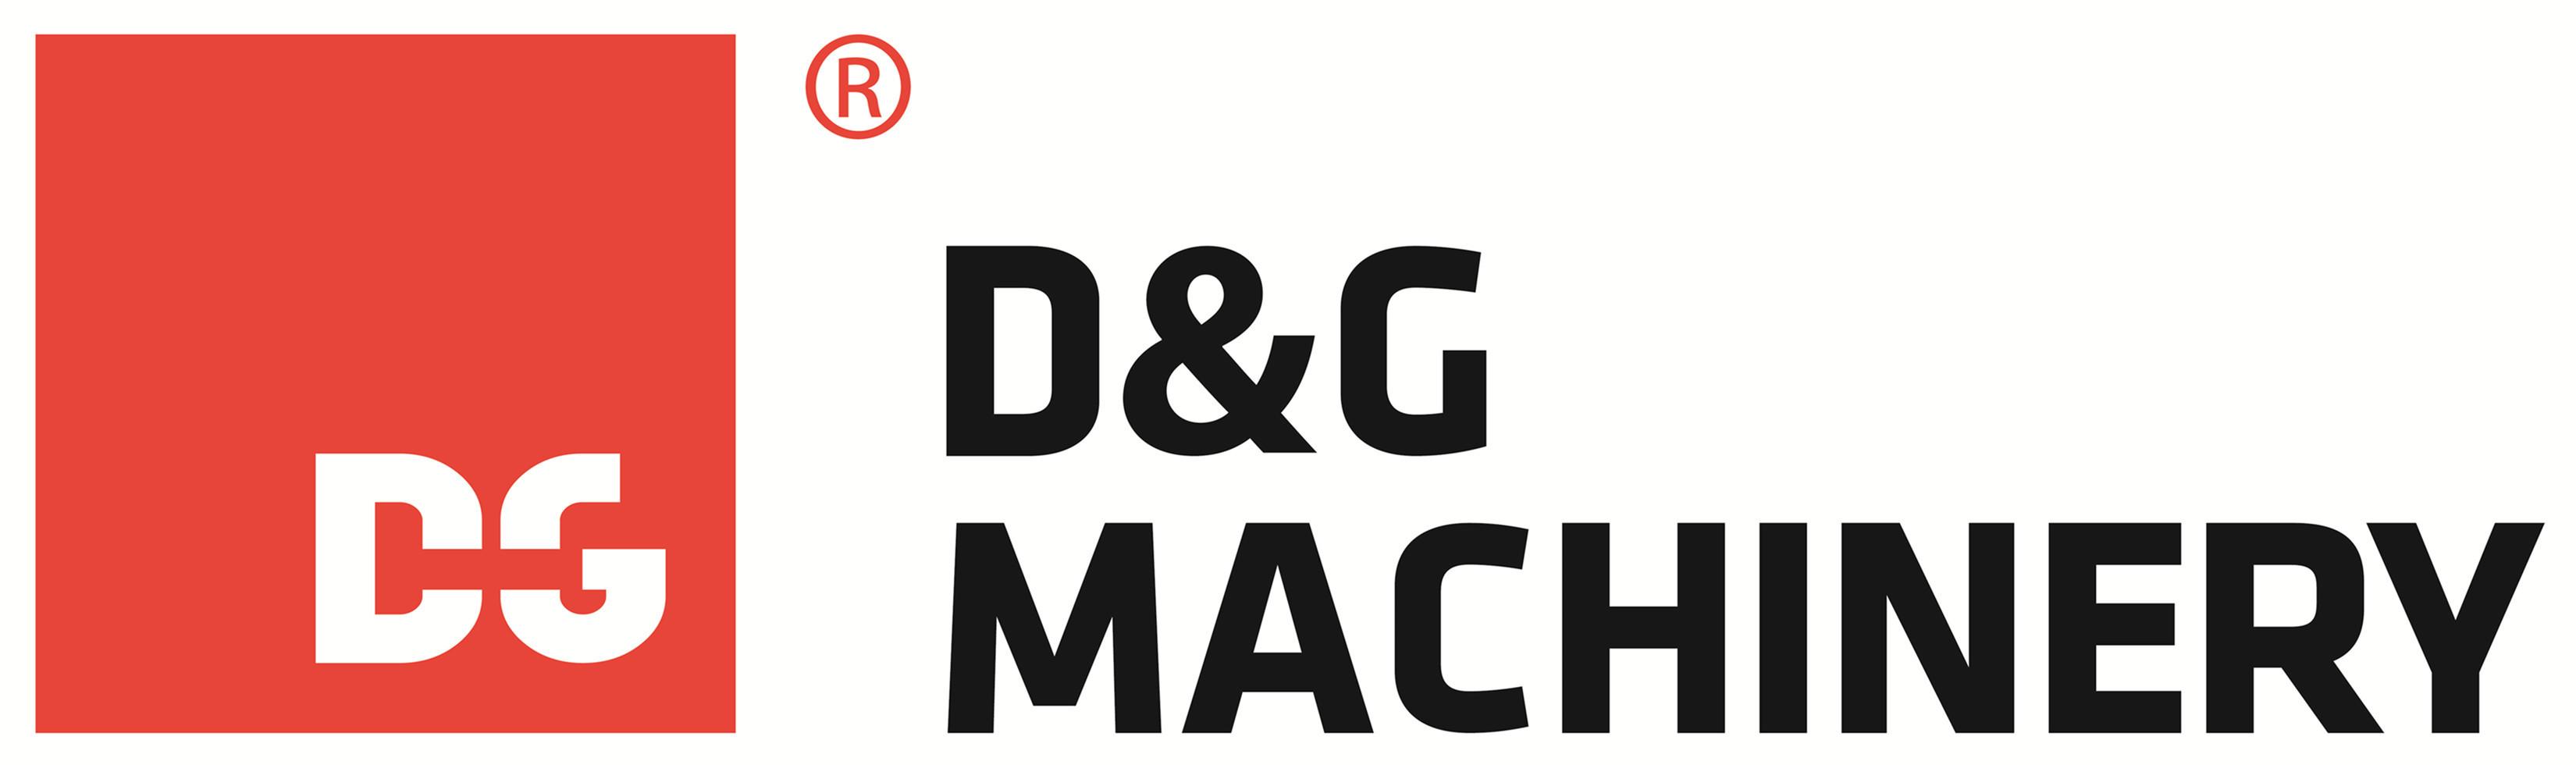 (c) Dgmachinery.net